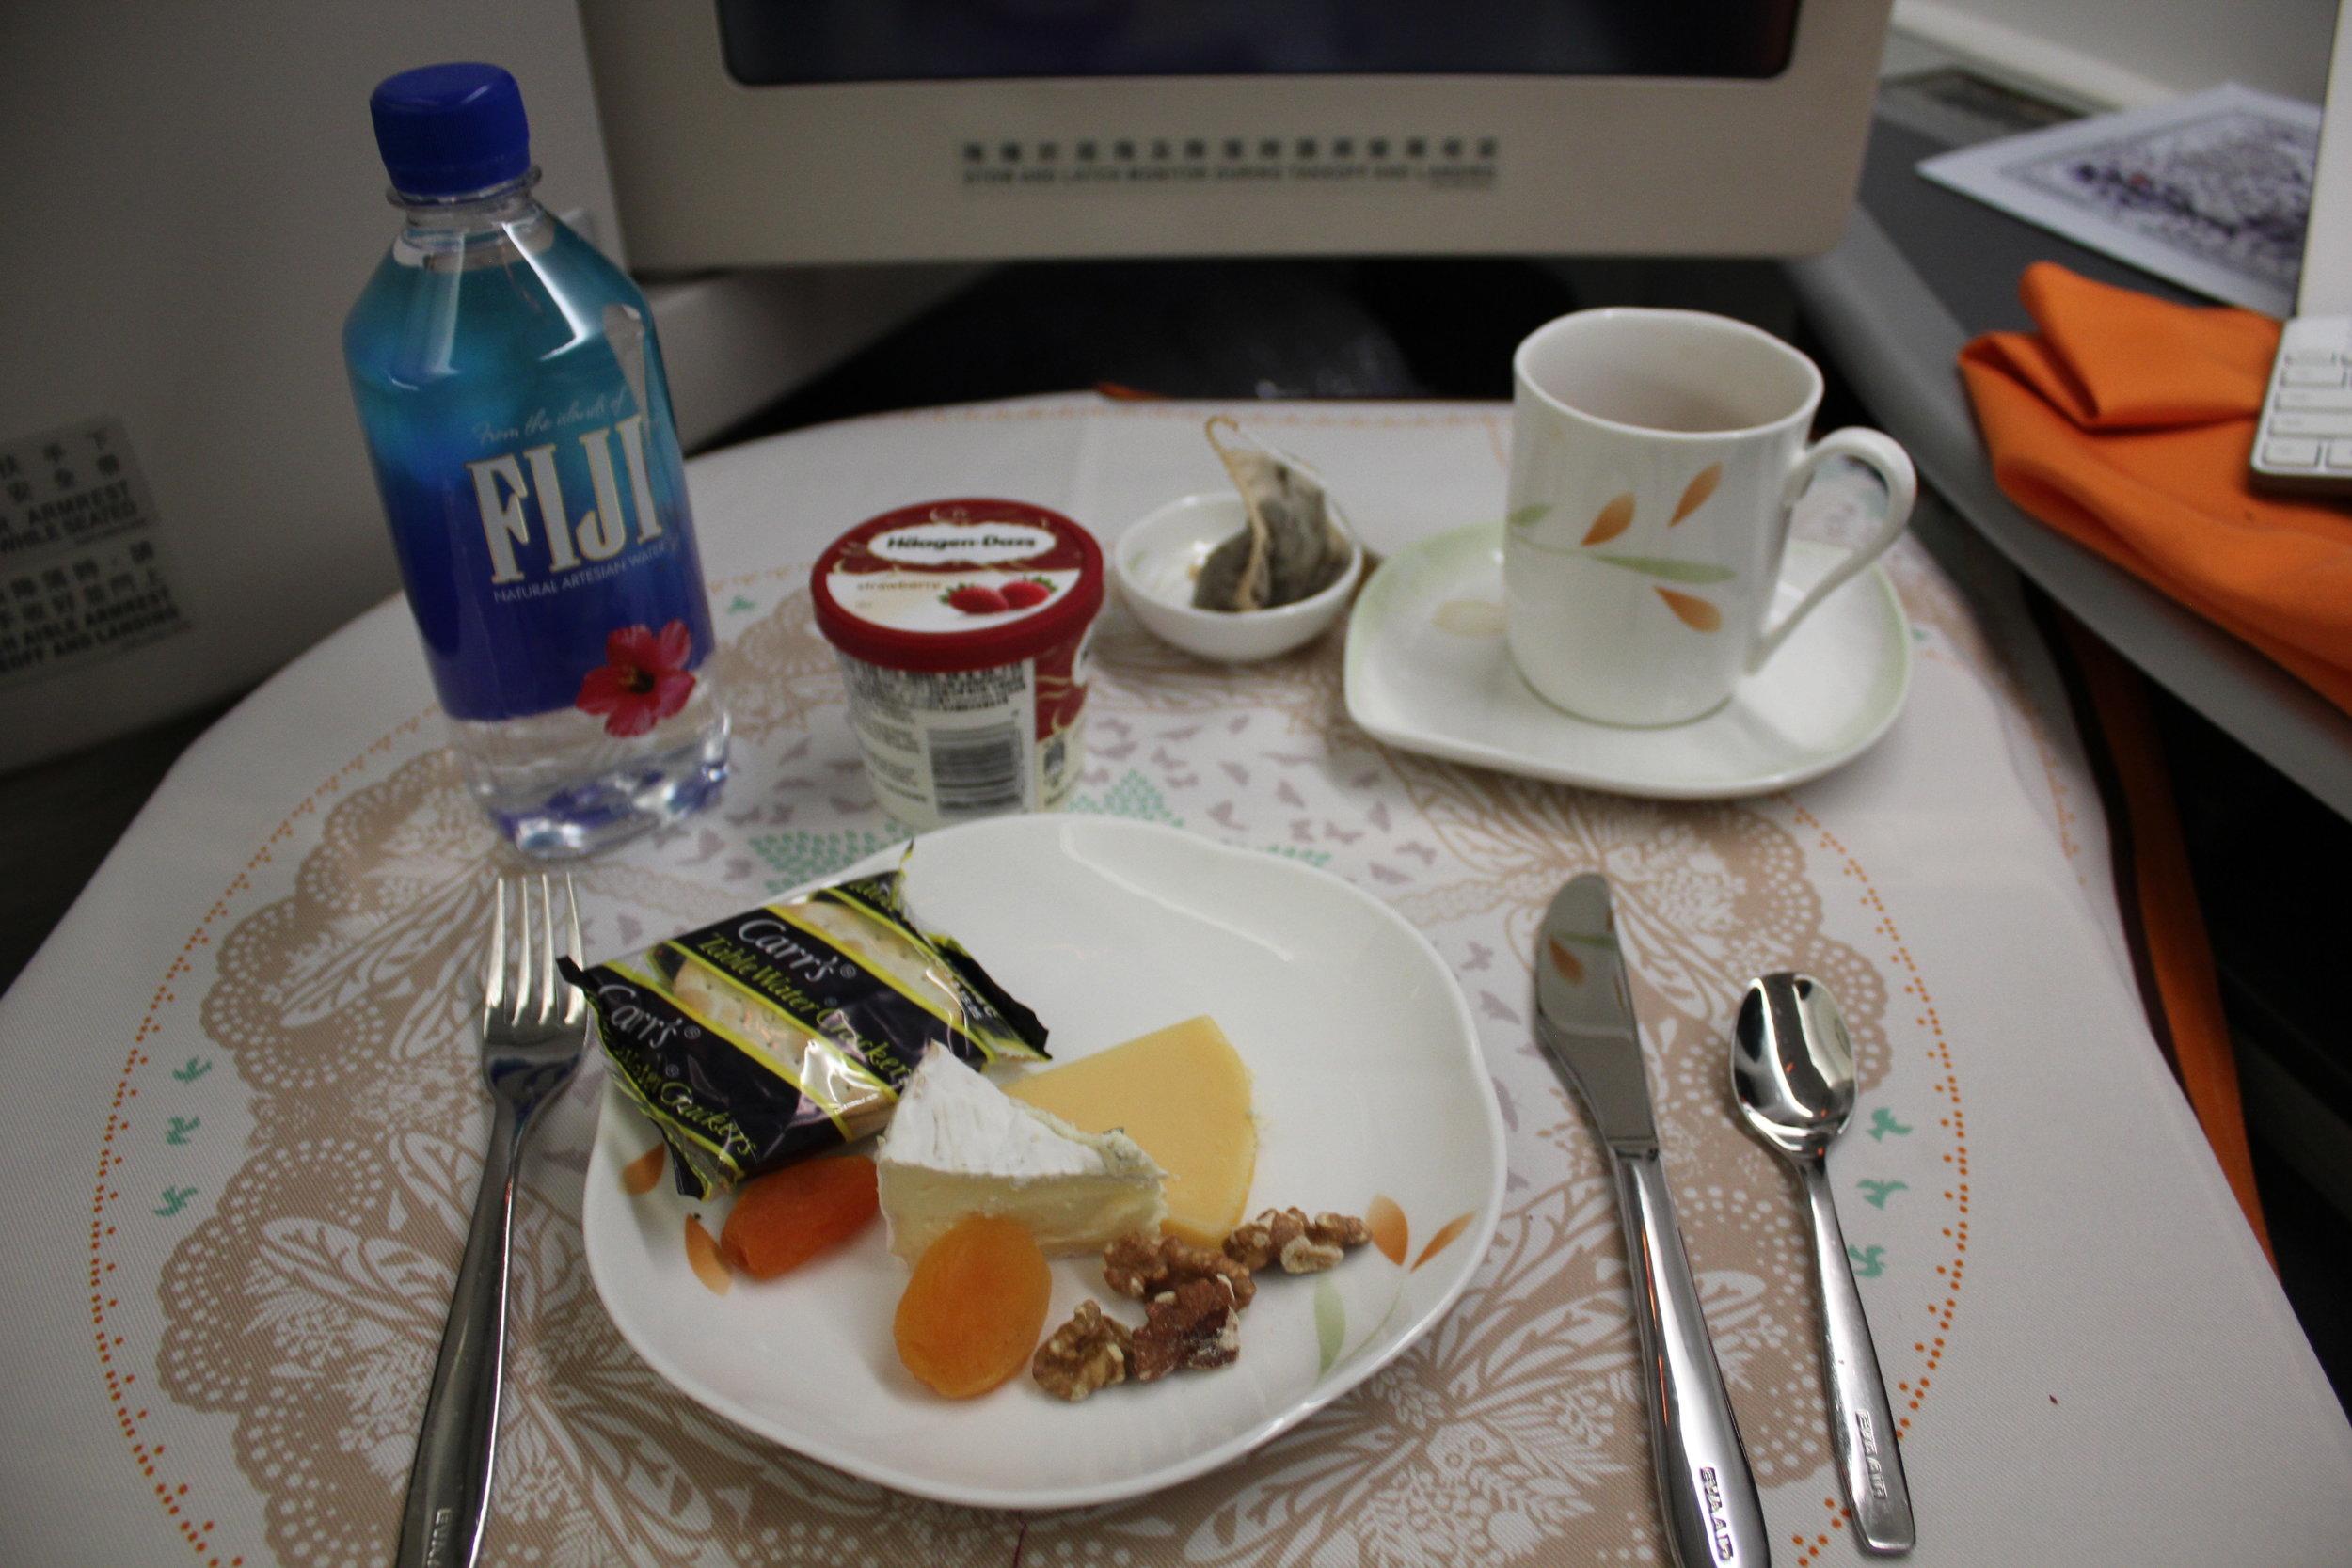 EVA Air business class – Cheese plate and dessert